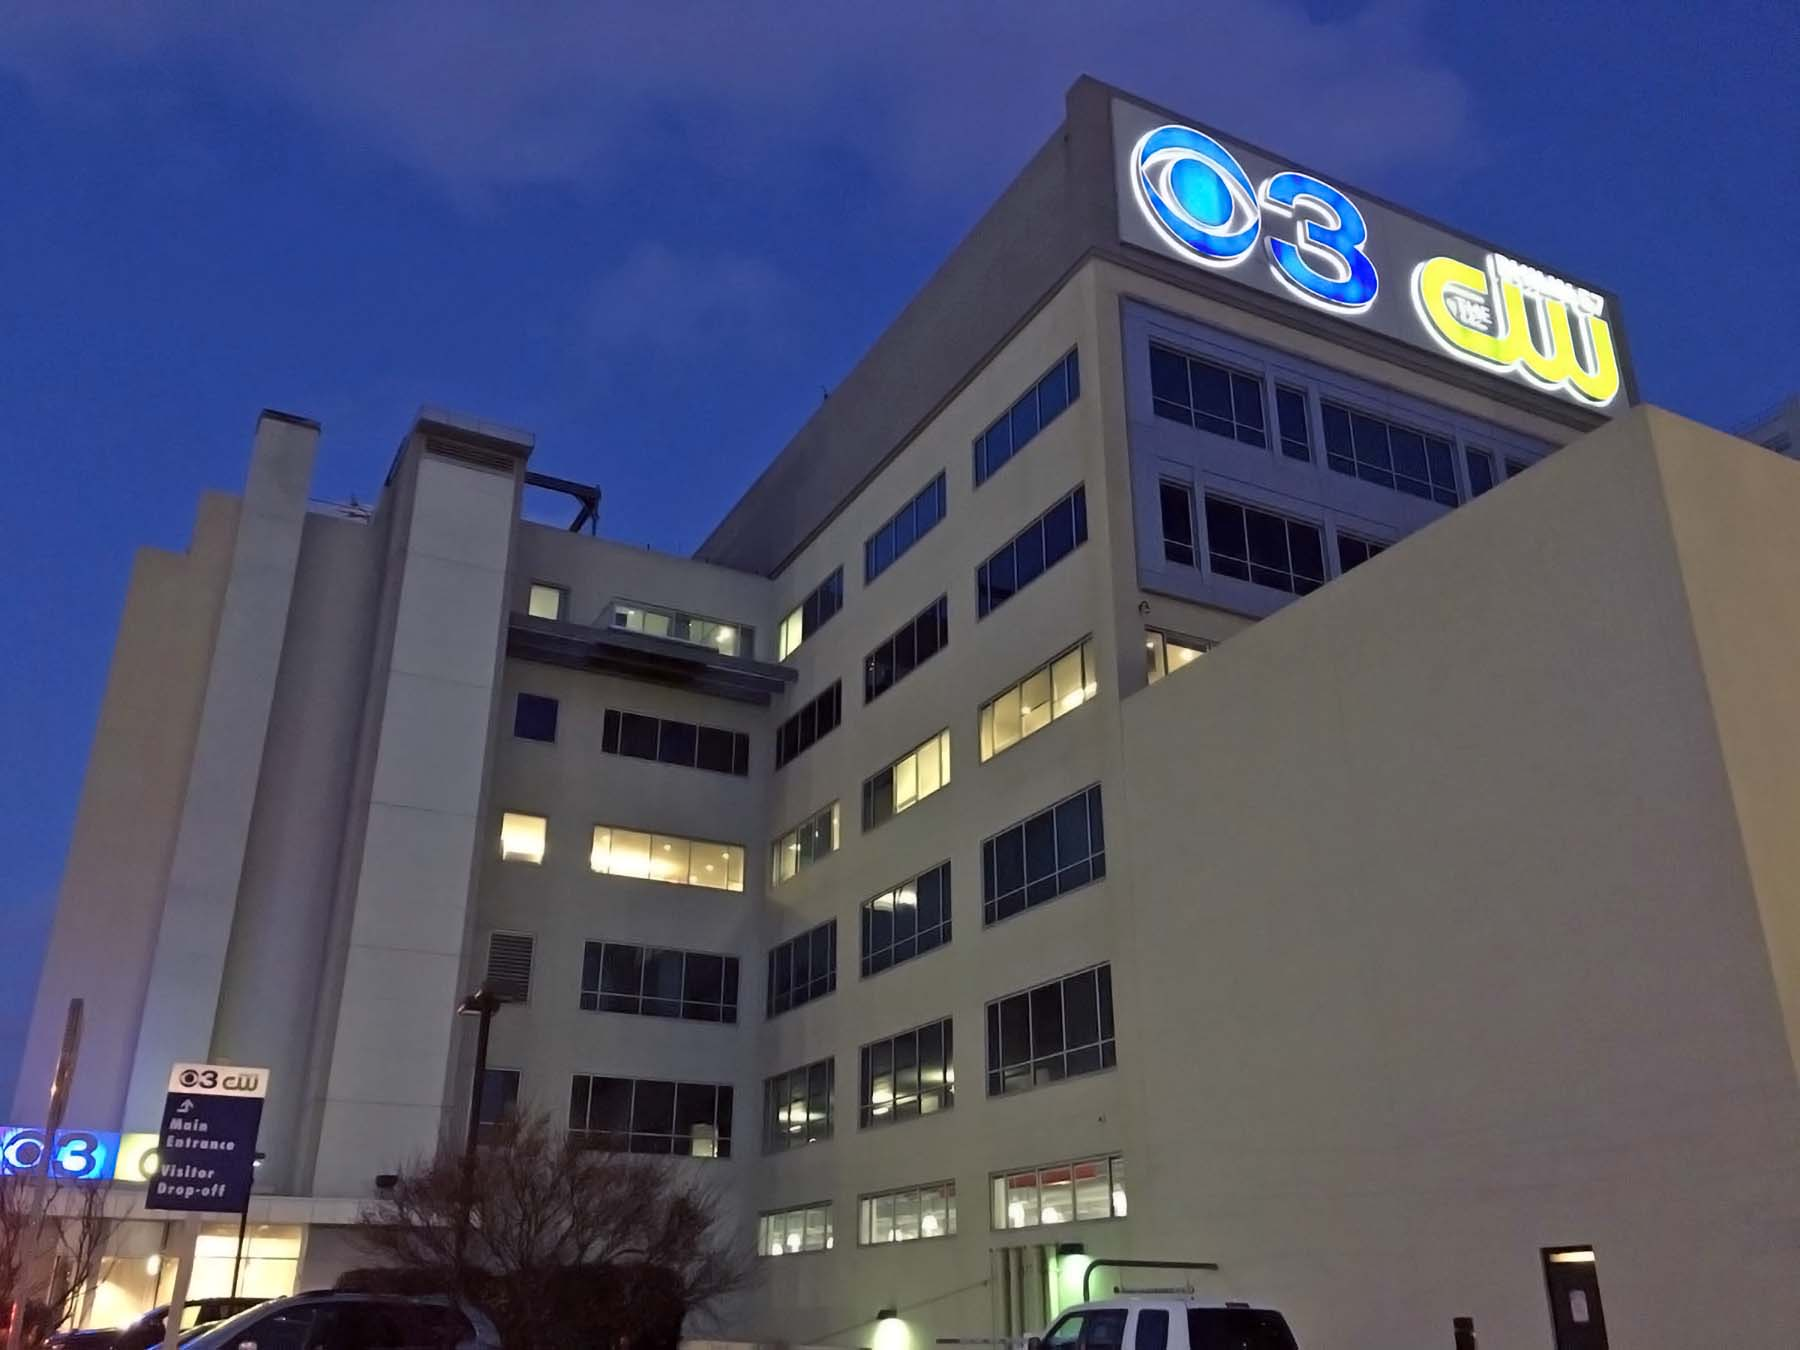 CBS 3 News Philly building